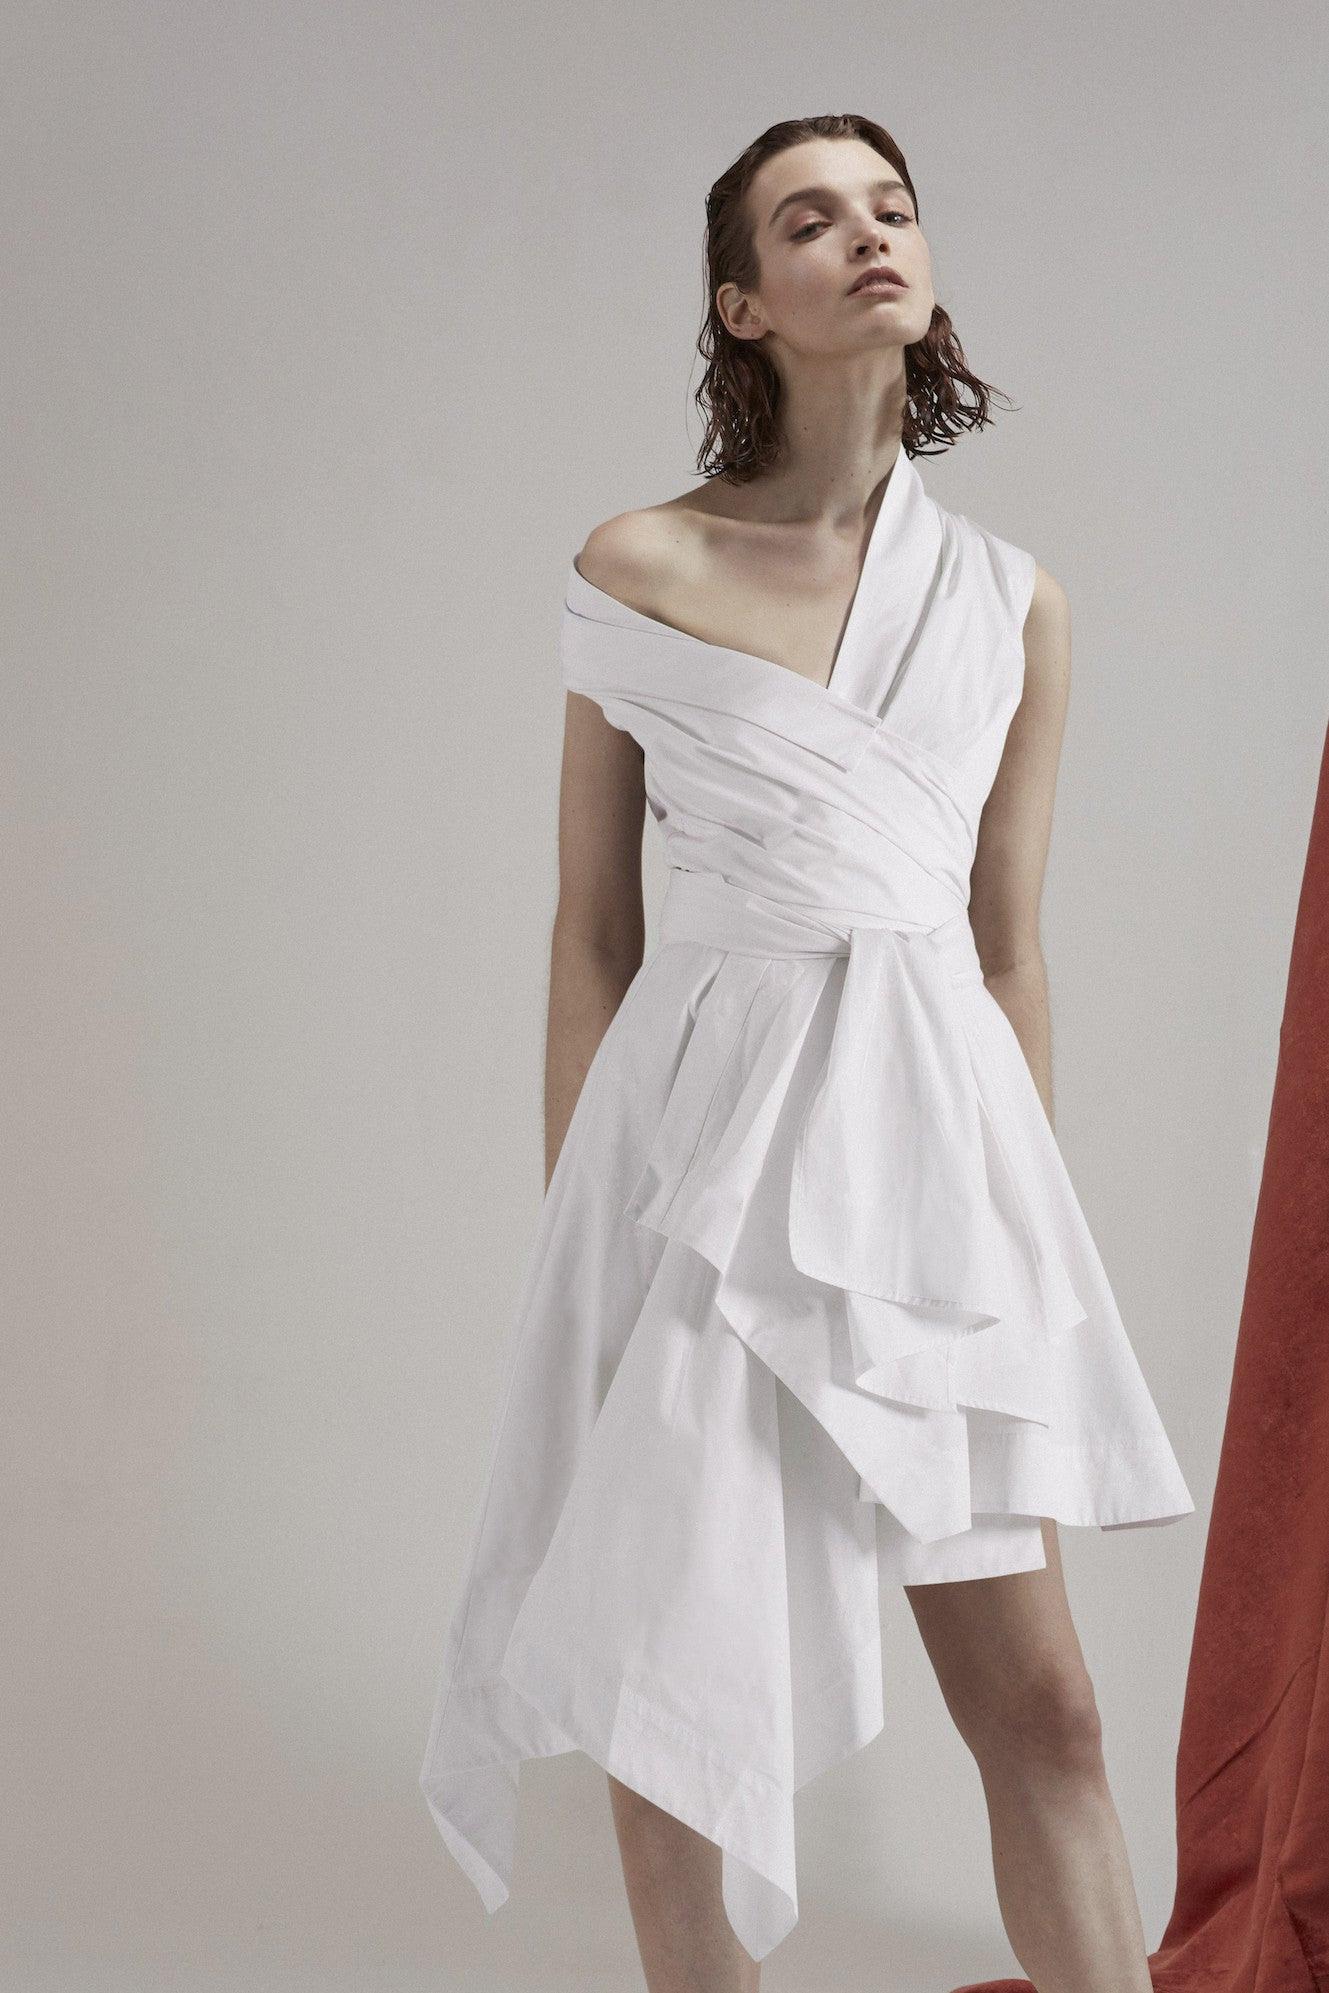 Kmart V Neck Belt Plain Short Sleeve Maxi Dresses girls evolution jumia bridesmaid